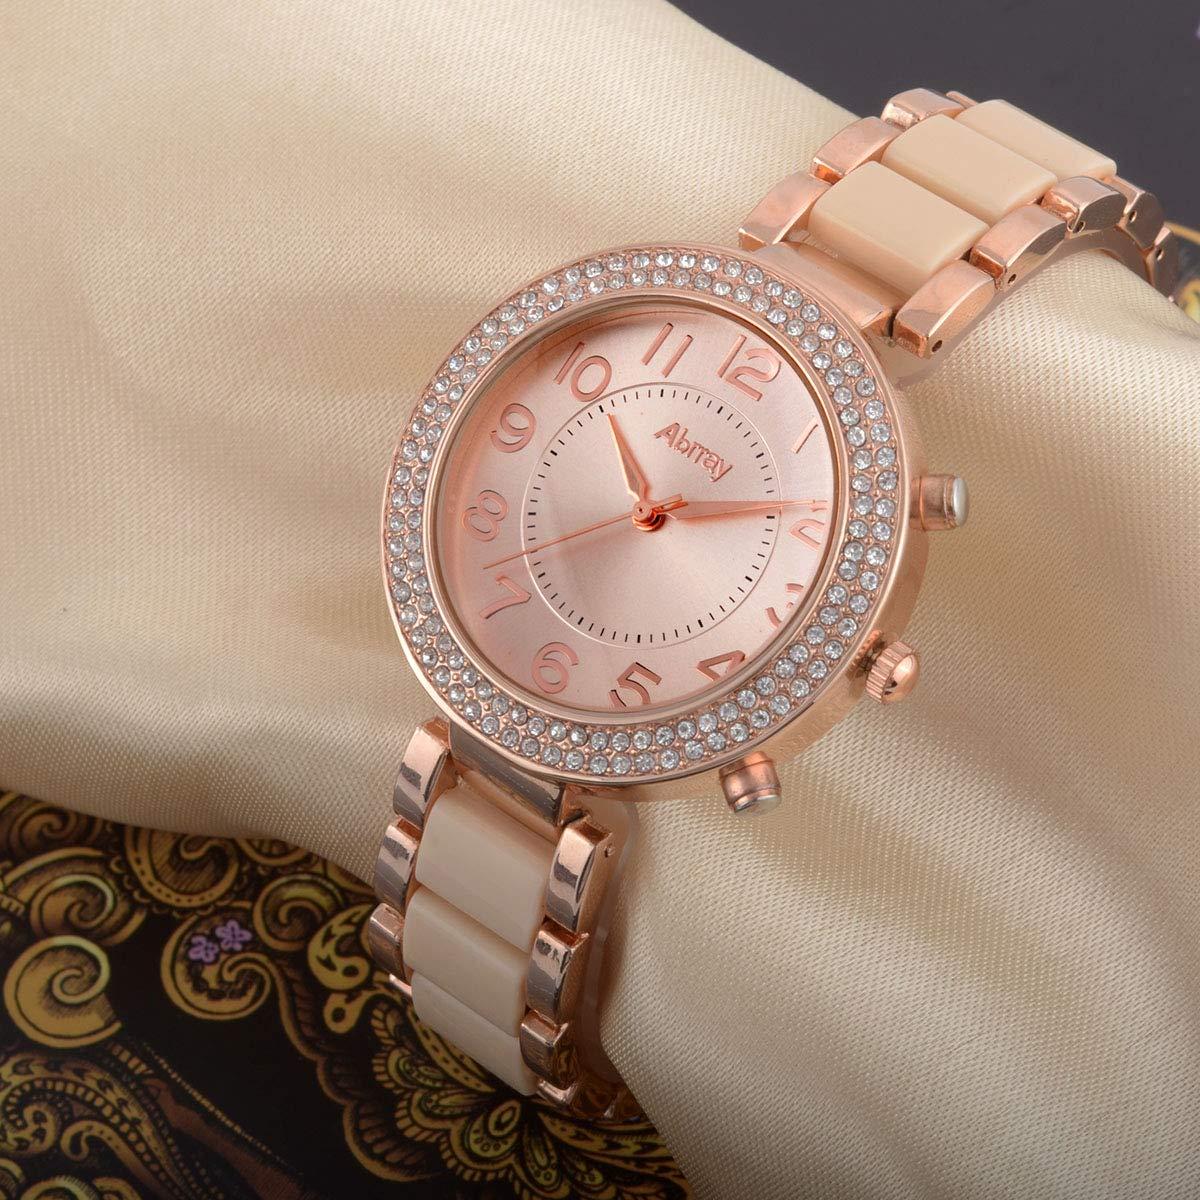 Abrray Analog Quartz Rhinestone Case Gold-Tone Bracelet Watch for Women with Arabic Numerals Display